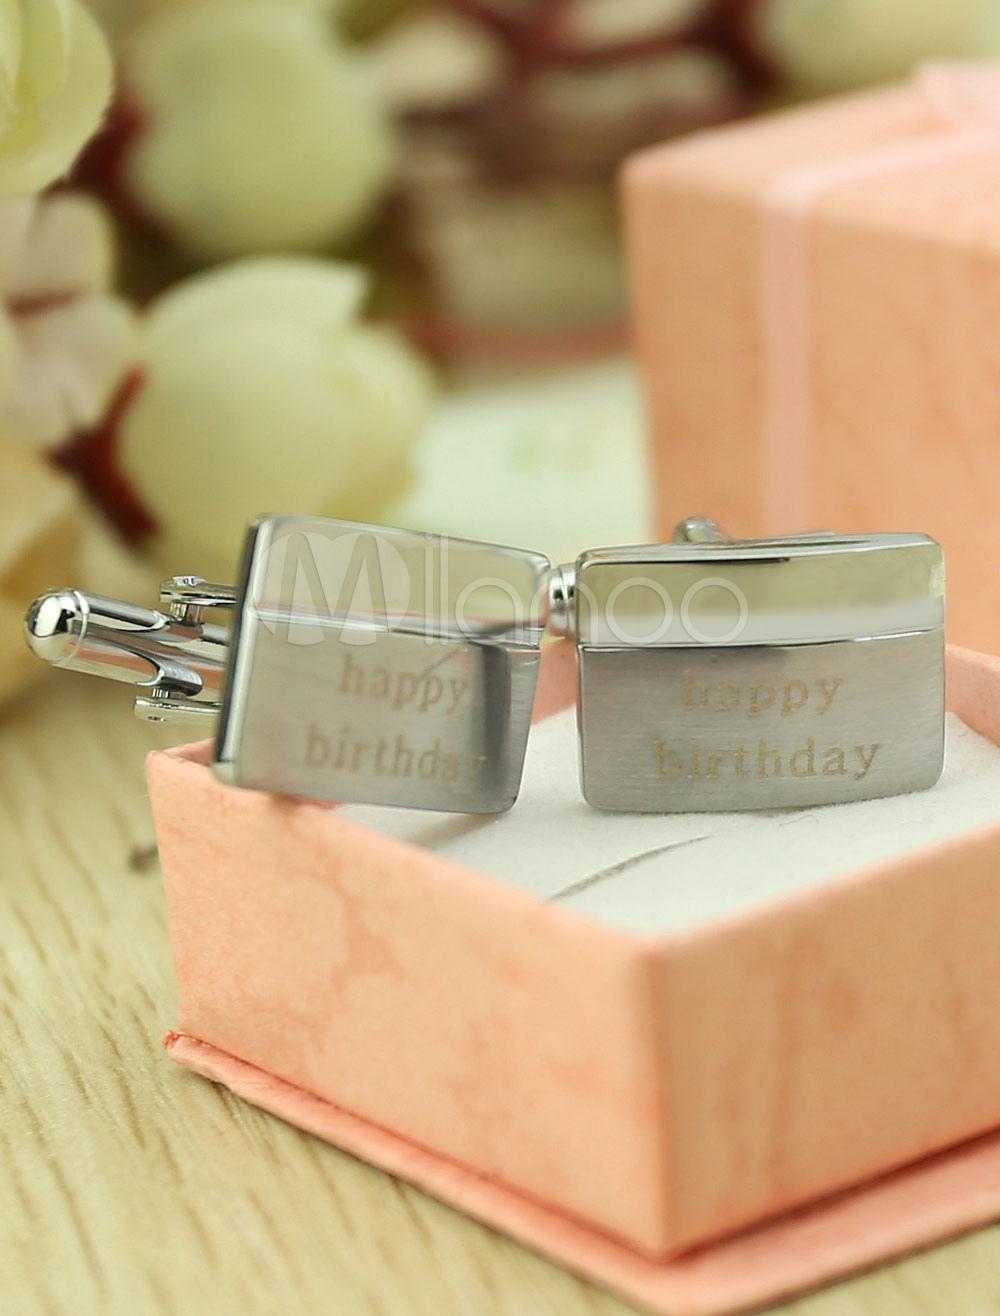 Wedding Personalised Cufflinks Men's Silver Customized Shirt Cufflinks Gift thumbnail